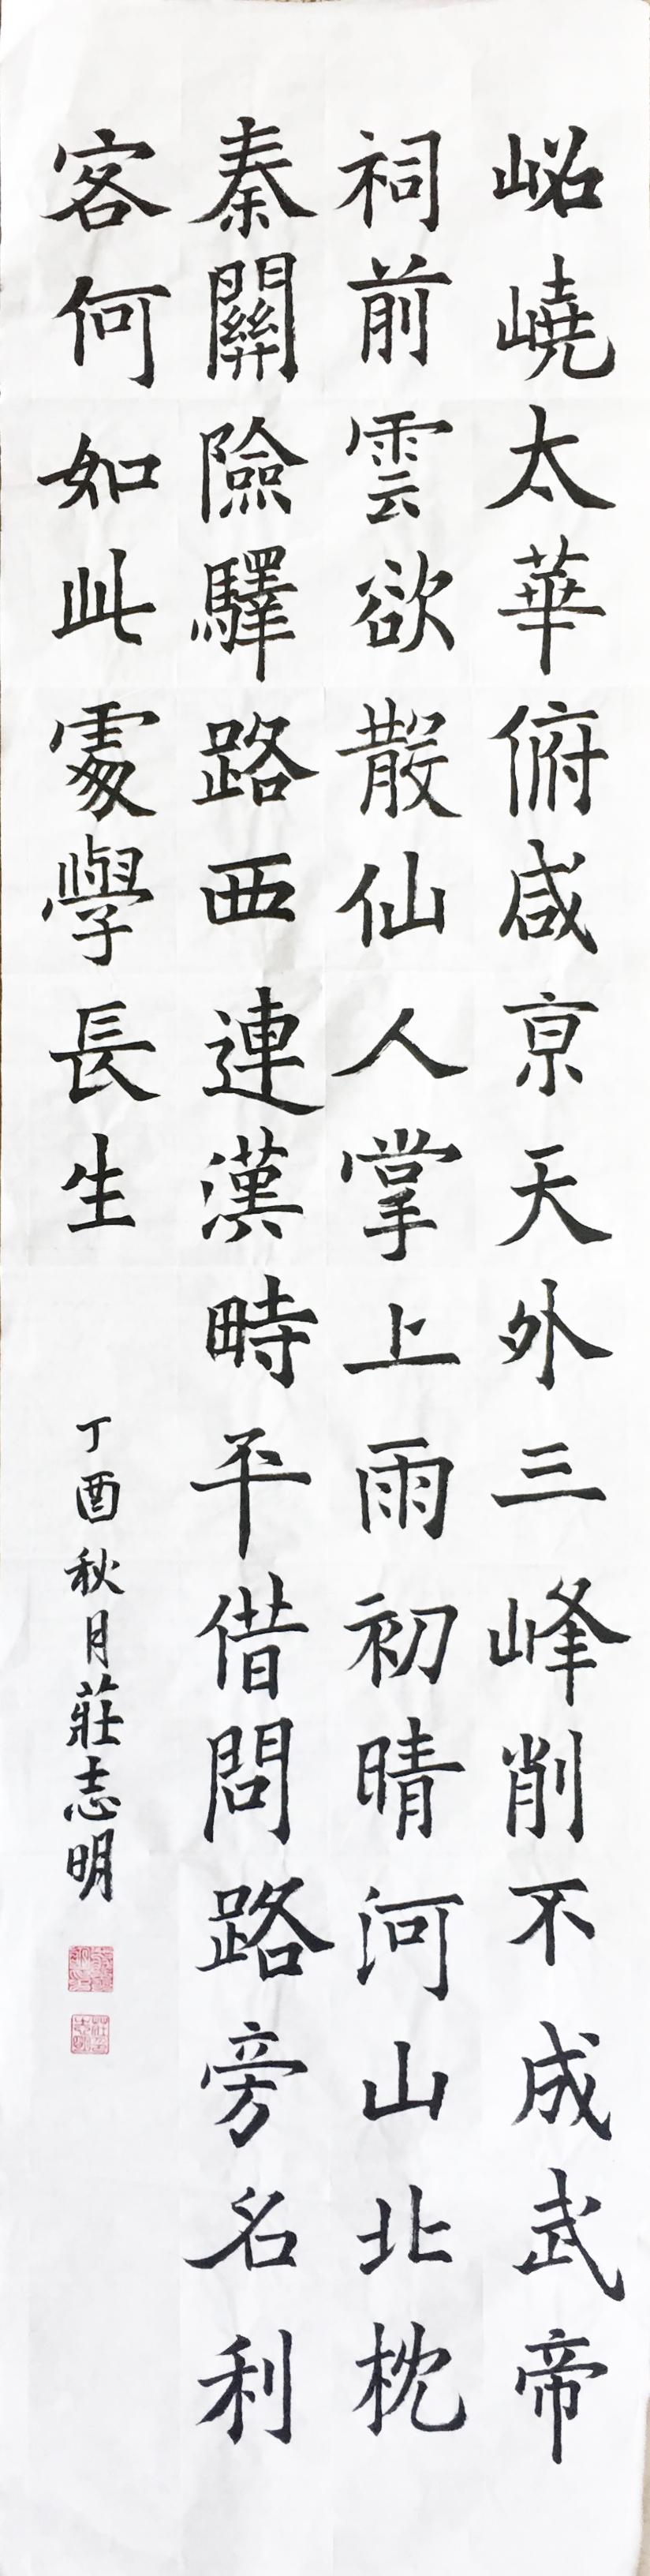 Ouyang Xun Kai Script (Tang Dynasty Poem)